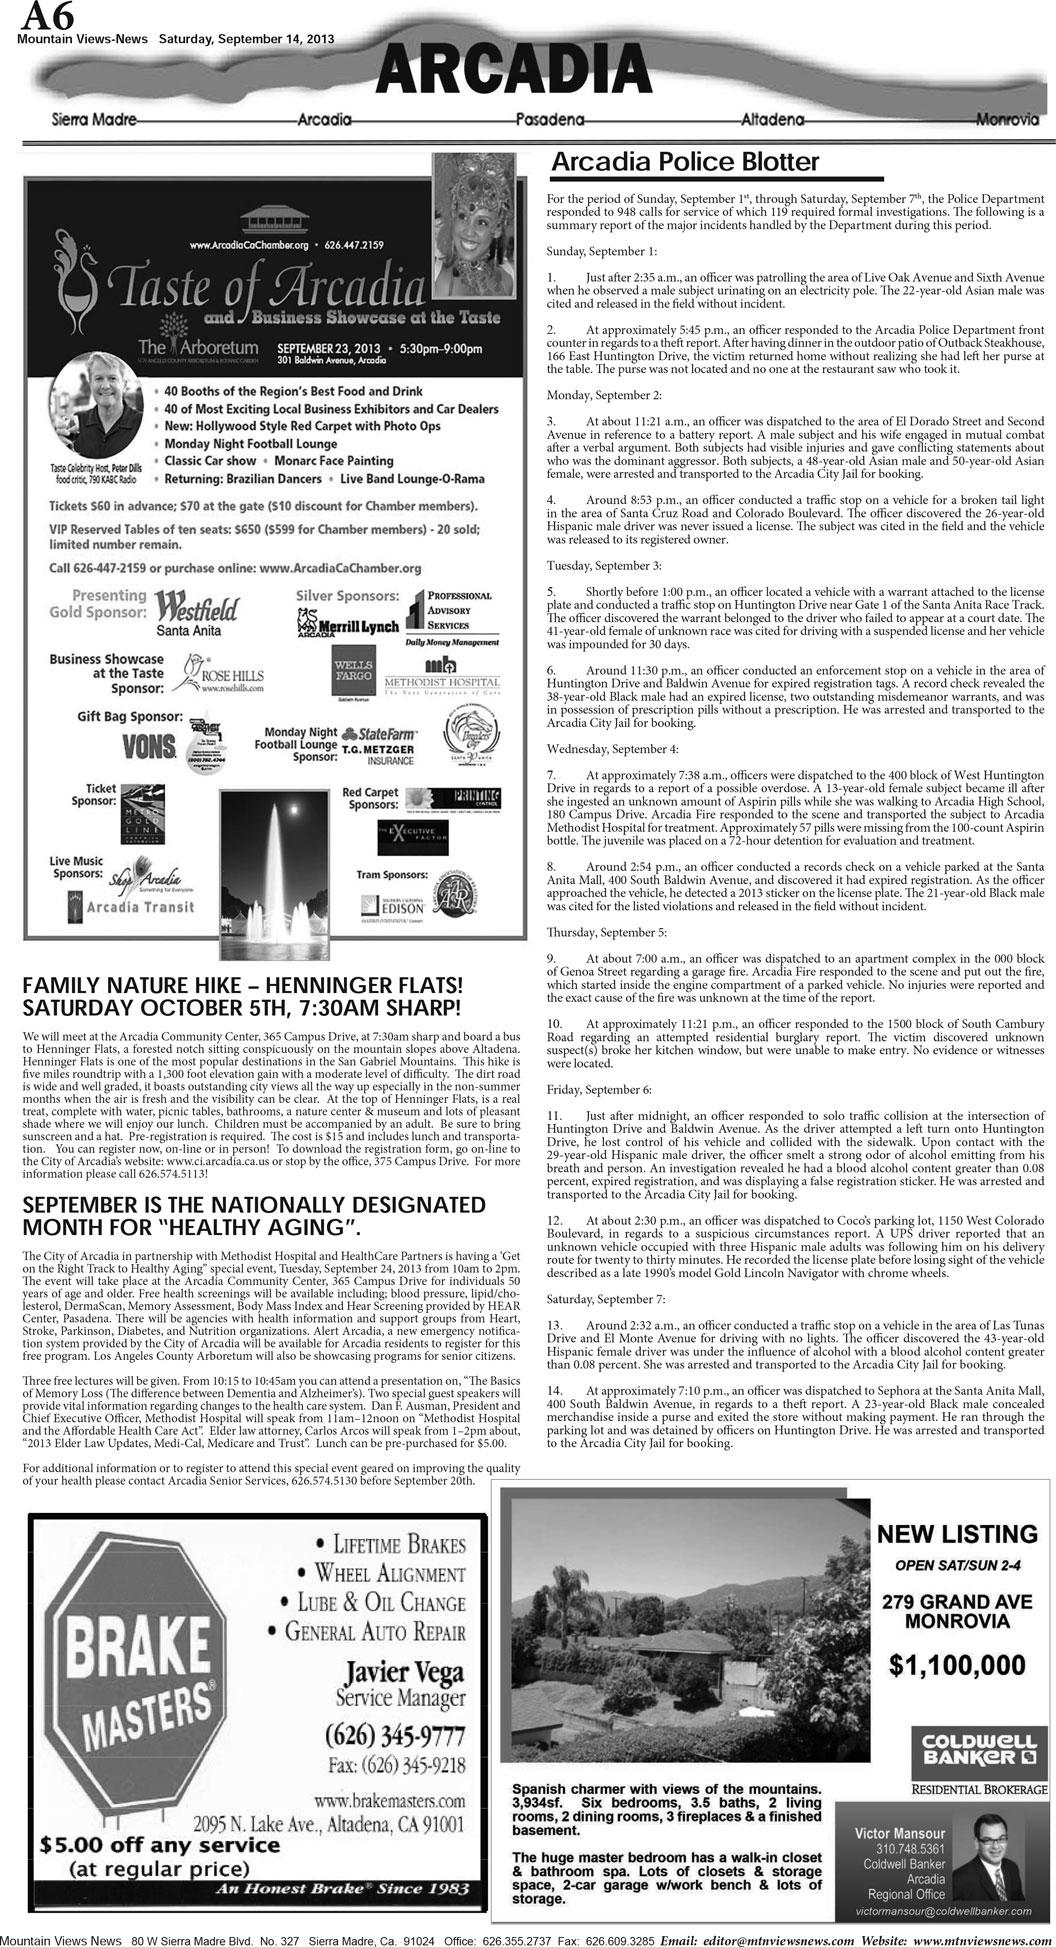 pA:6, v7 37 — Arcadia — Mountain Views News